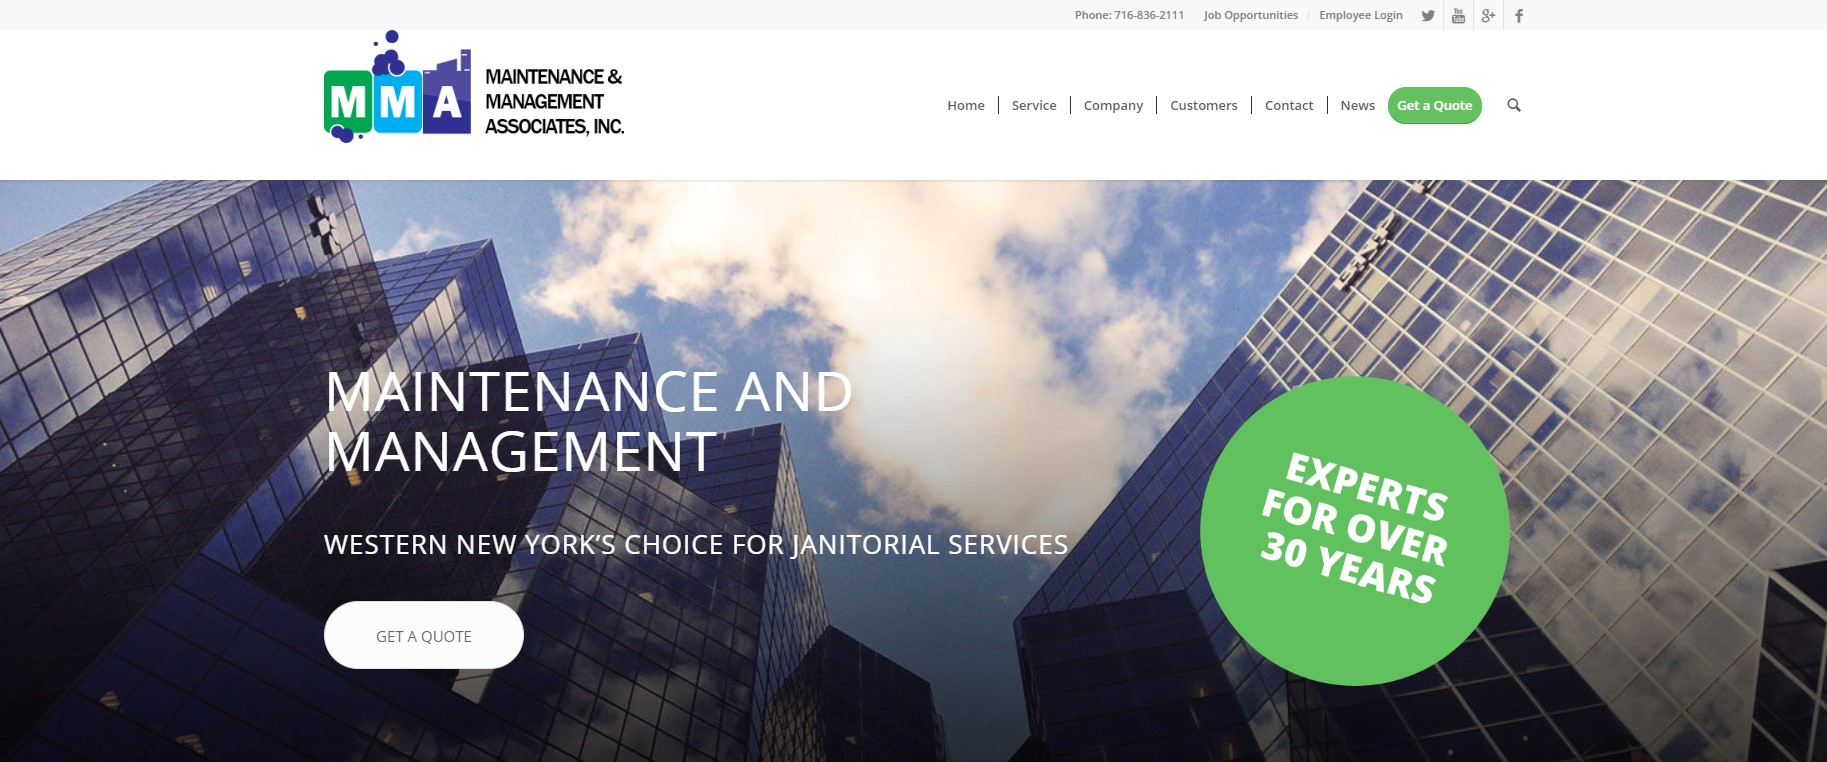 Maintenance and management associates homepage screenshot.jpg